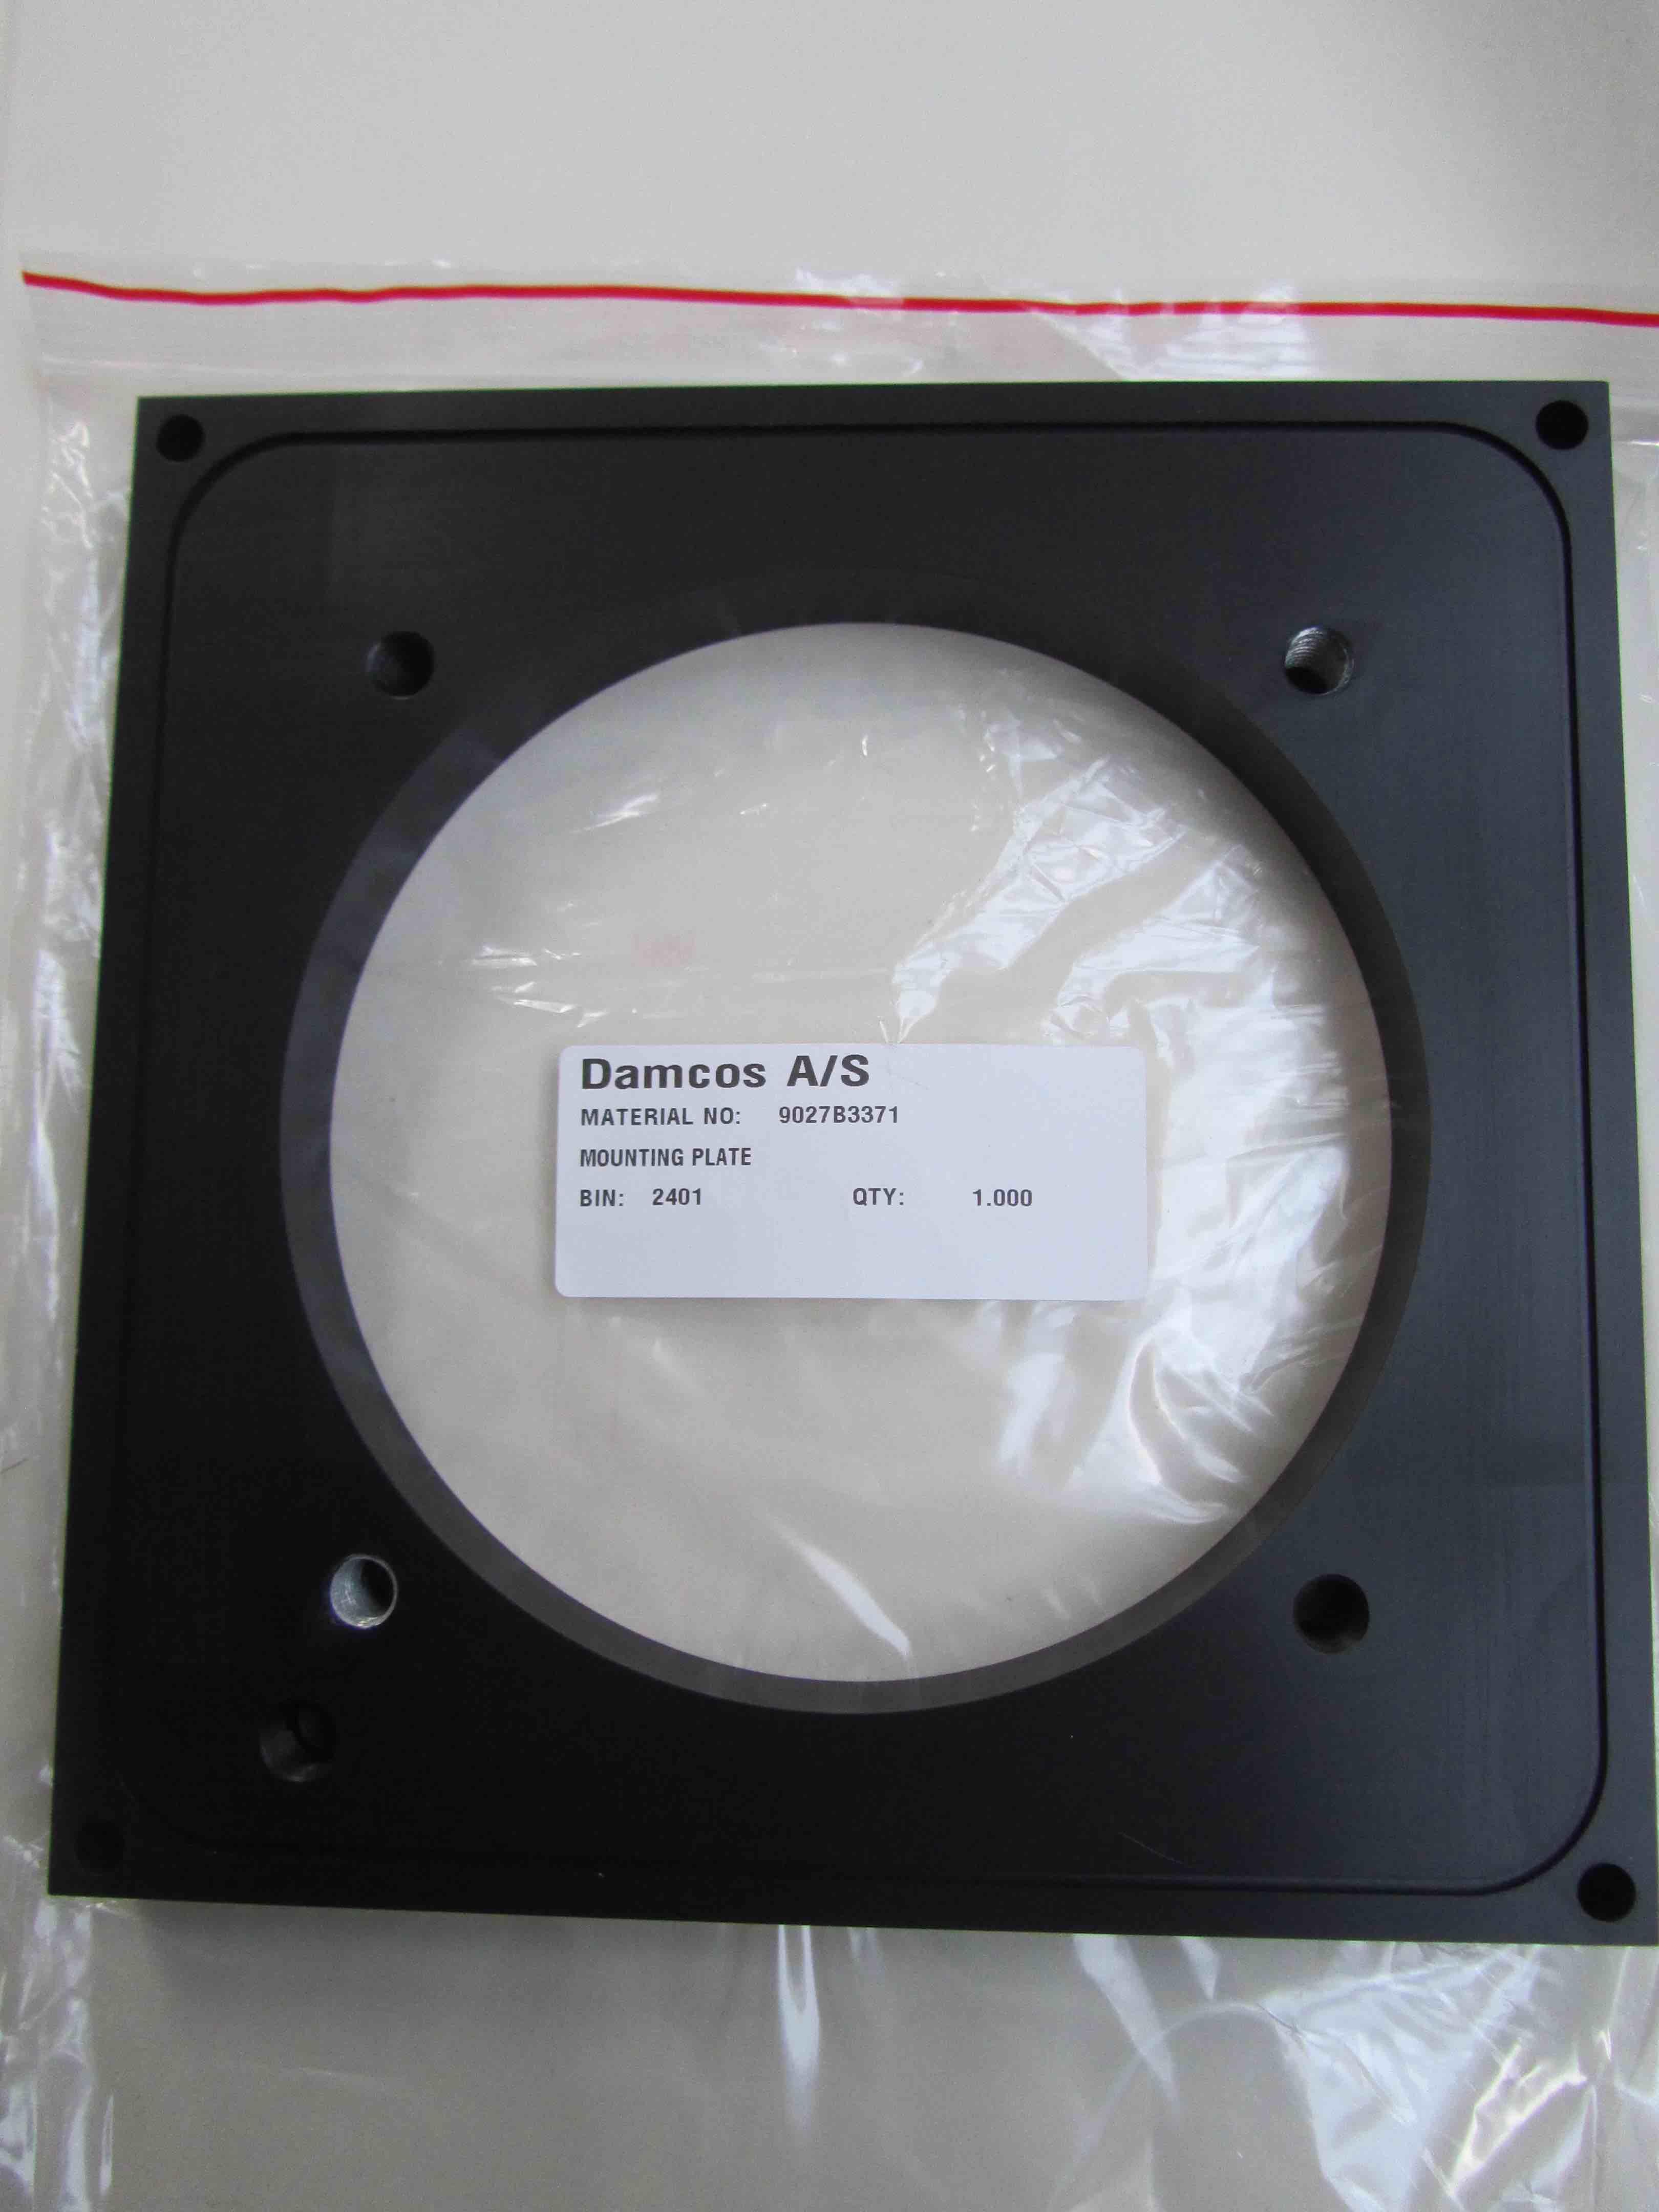 Damcos 9027B3771 Mounting Plate